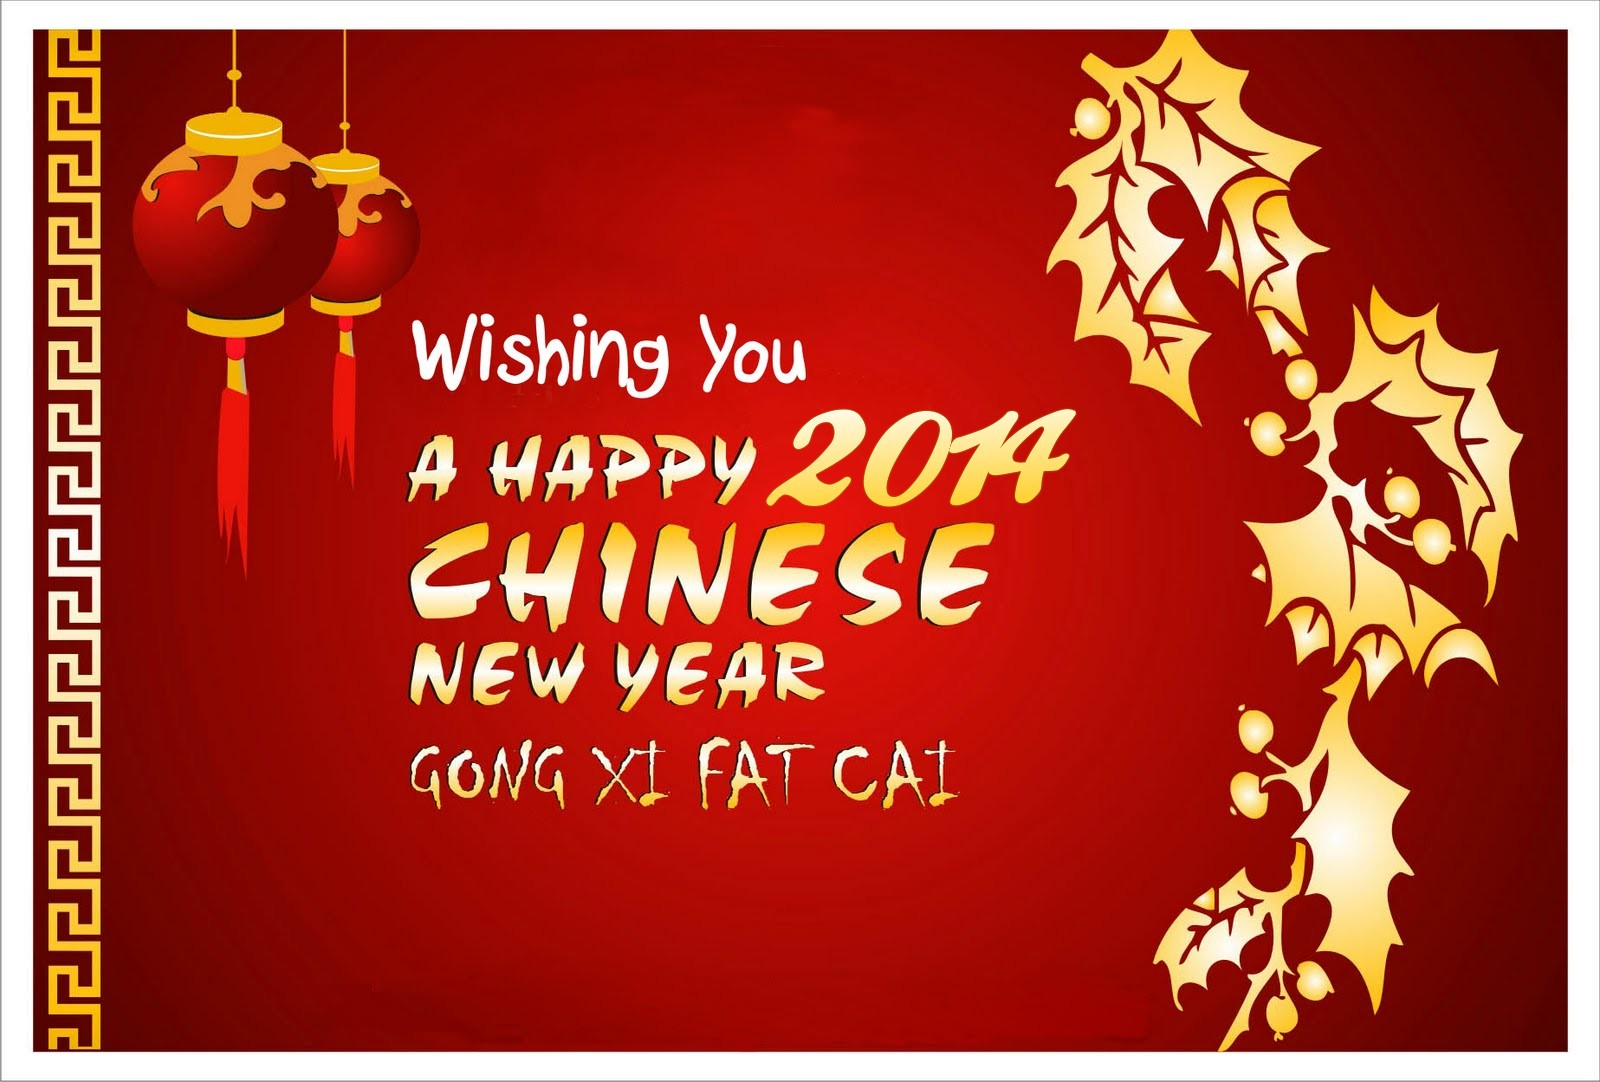 Image chinese new year 2014 horse wishes hdg glee tv show chinese new year 2014 horse wishes hdg m4hsunfo